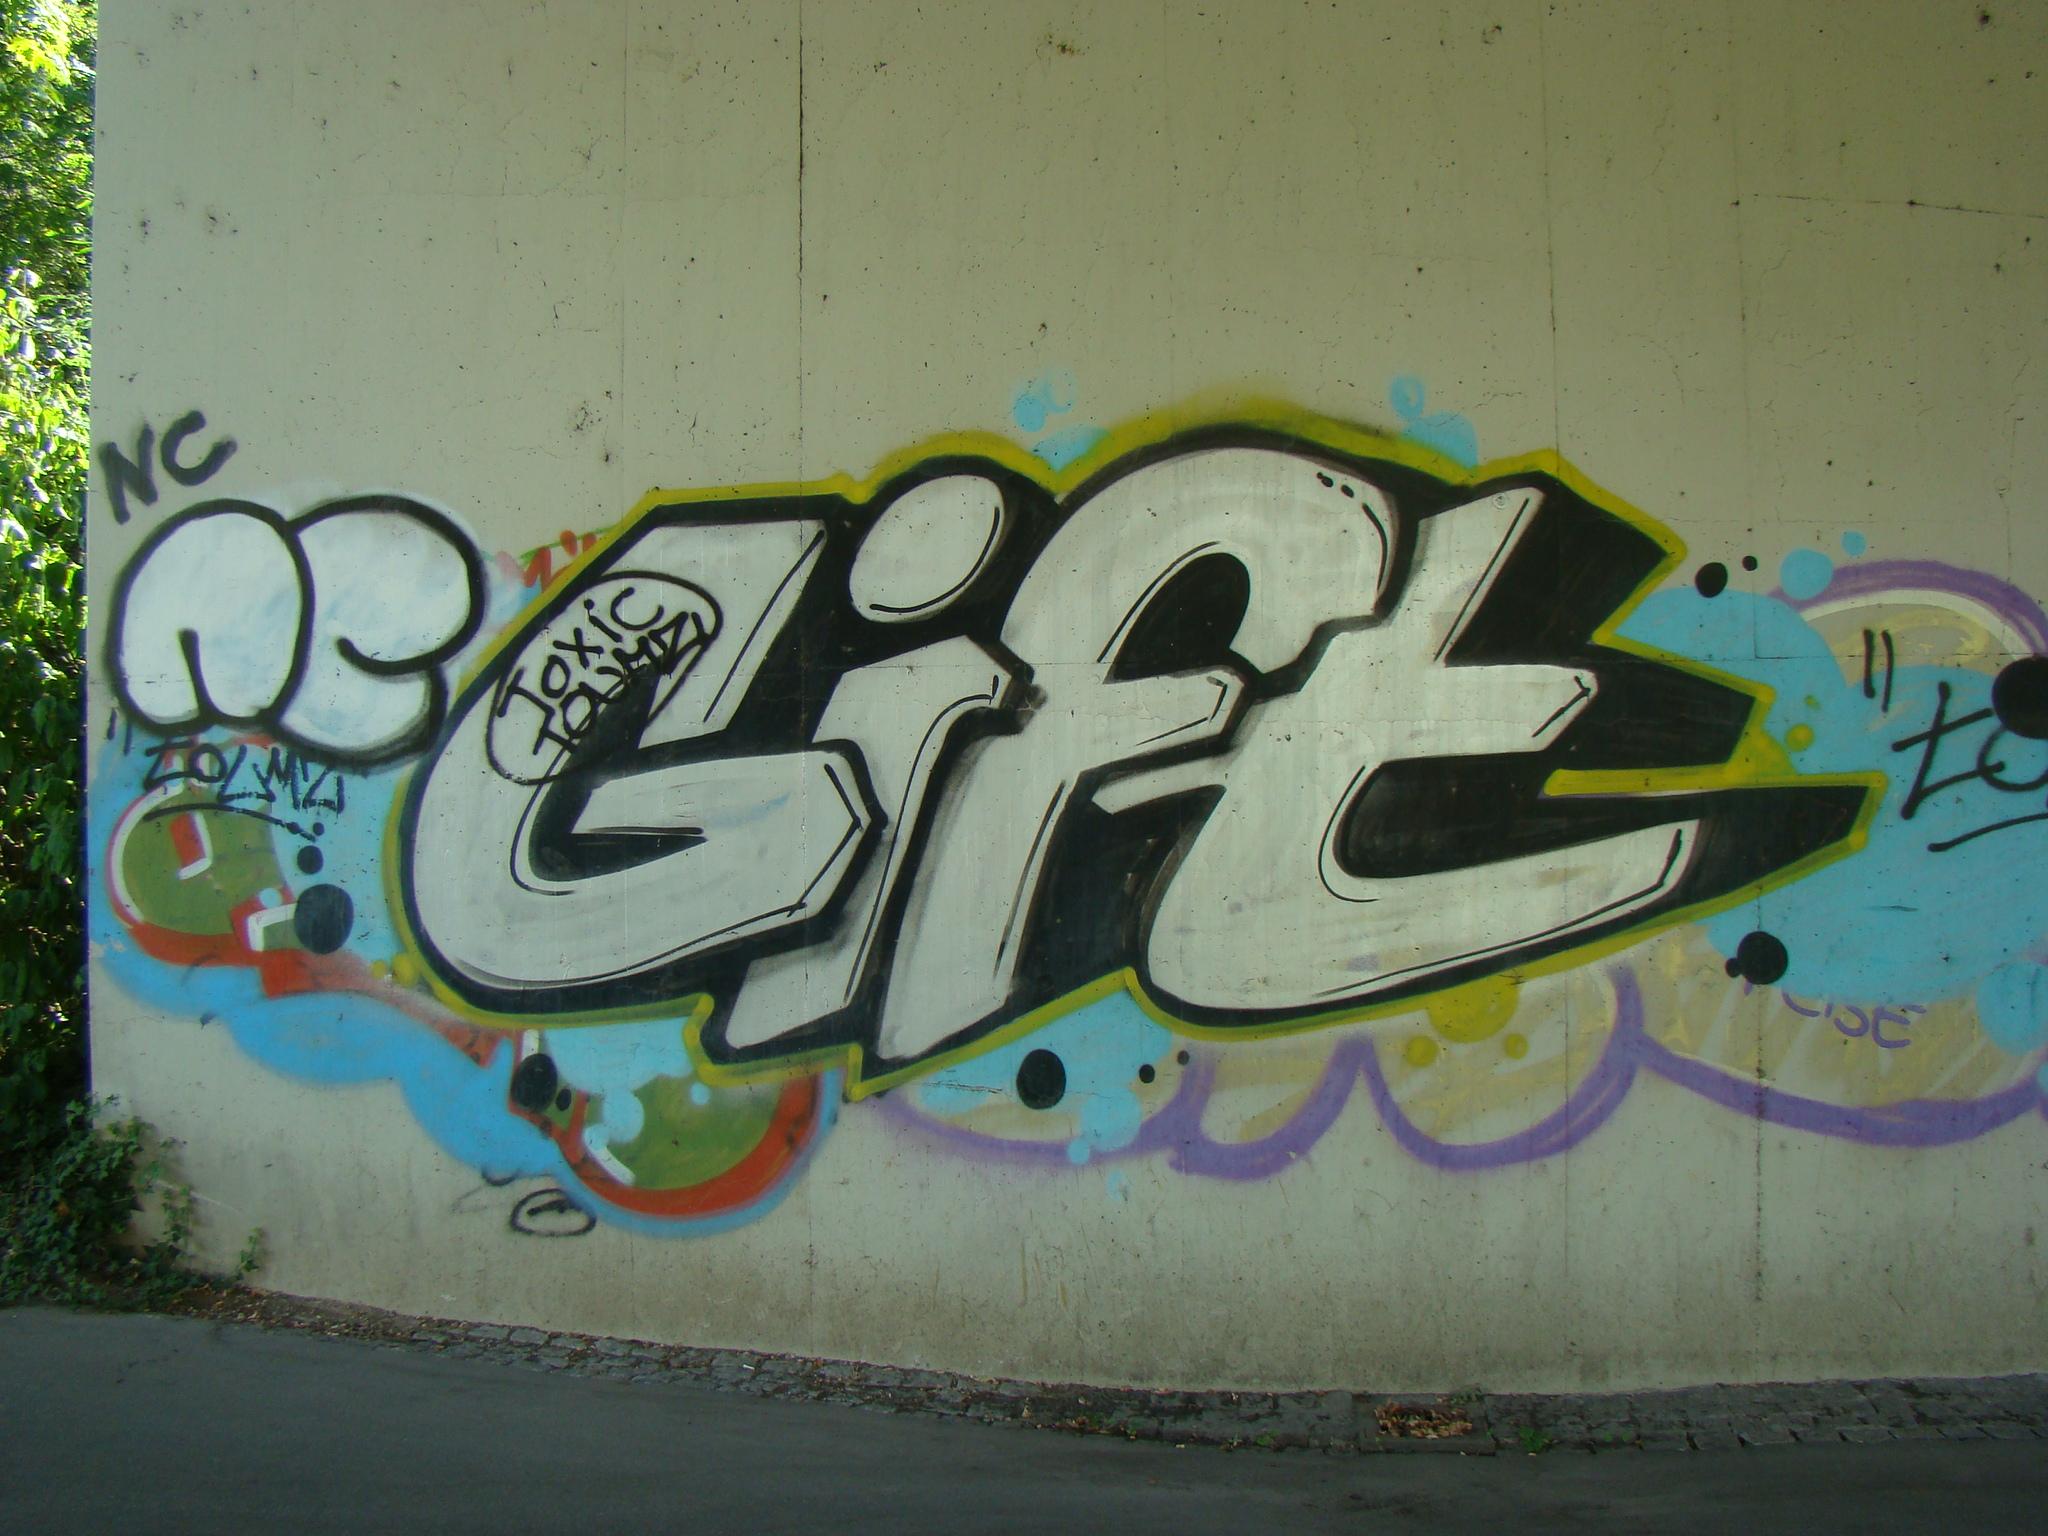 Filensu graffiti 2015 301 jpg